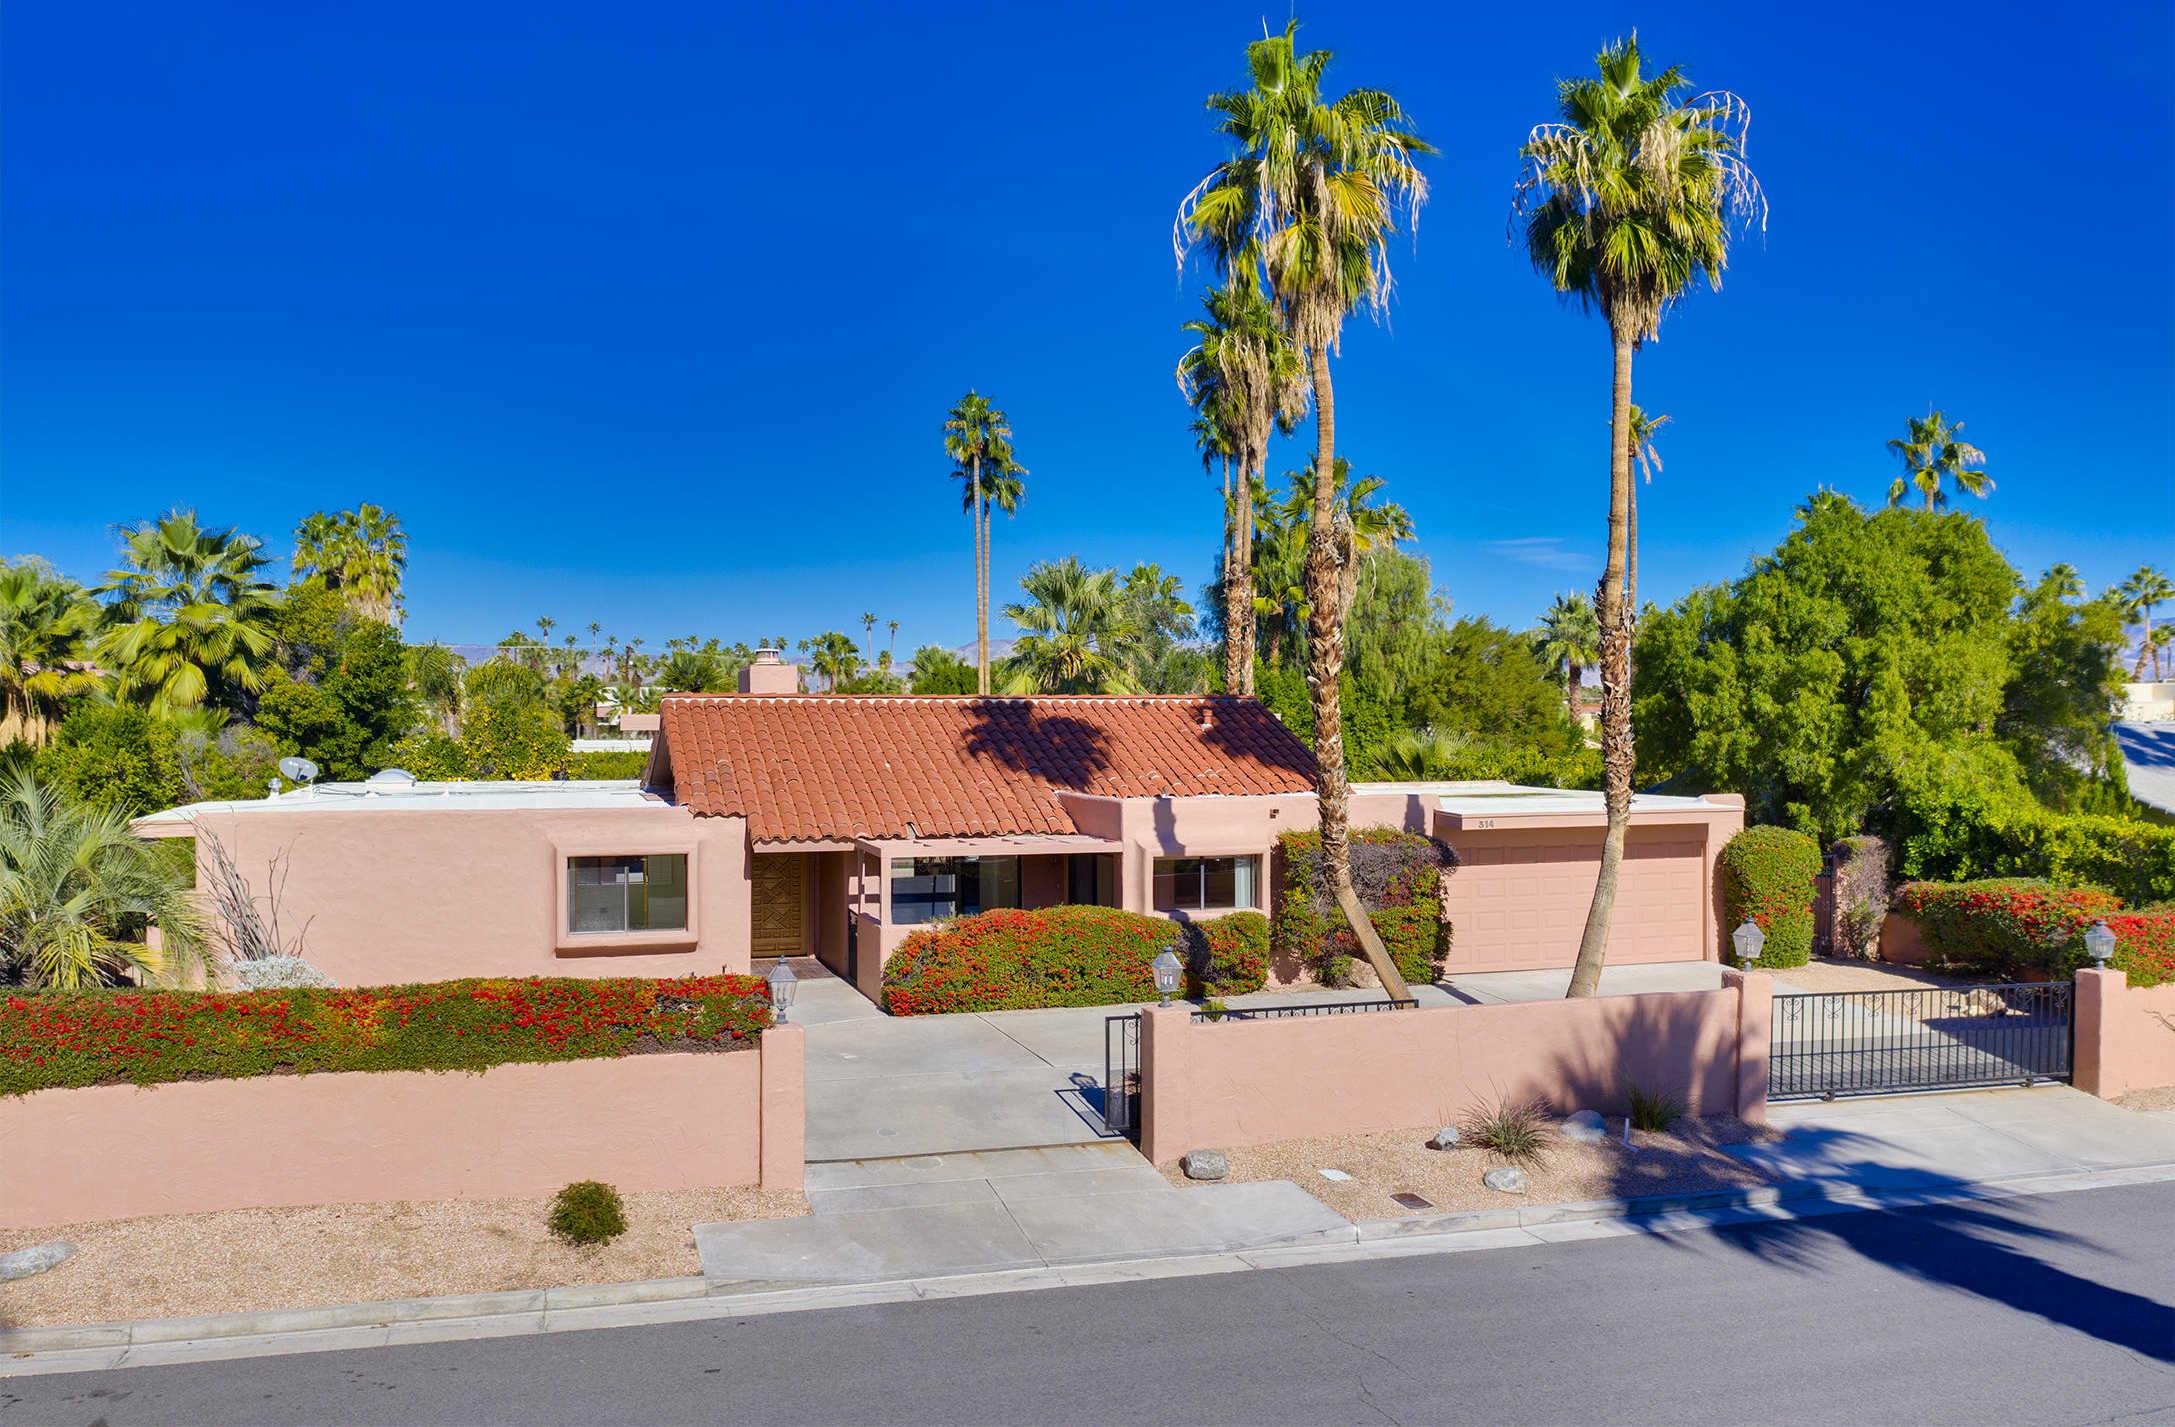 $1,225,000 - 3Br/2Ba -  for Sale in Vista Las Palmas, Palm Springs